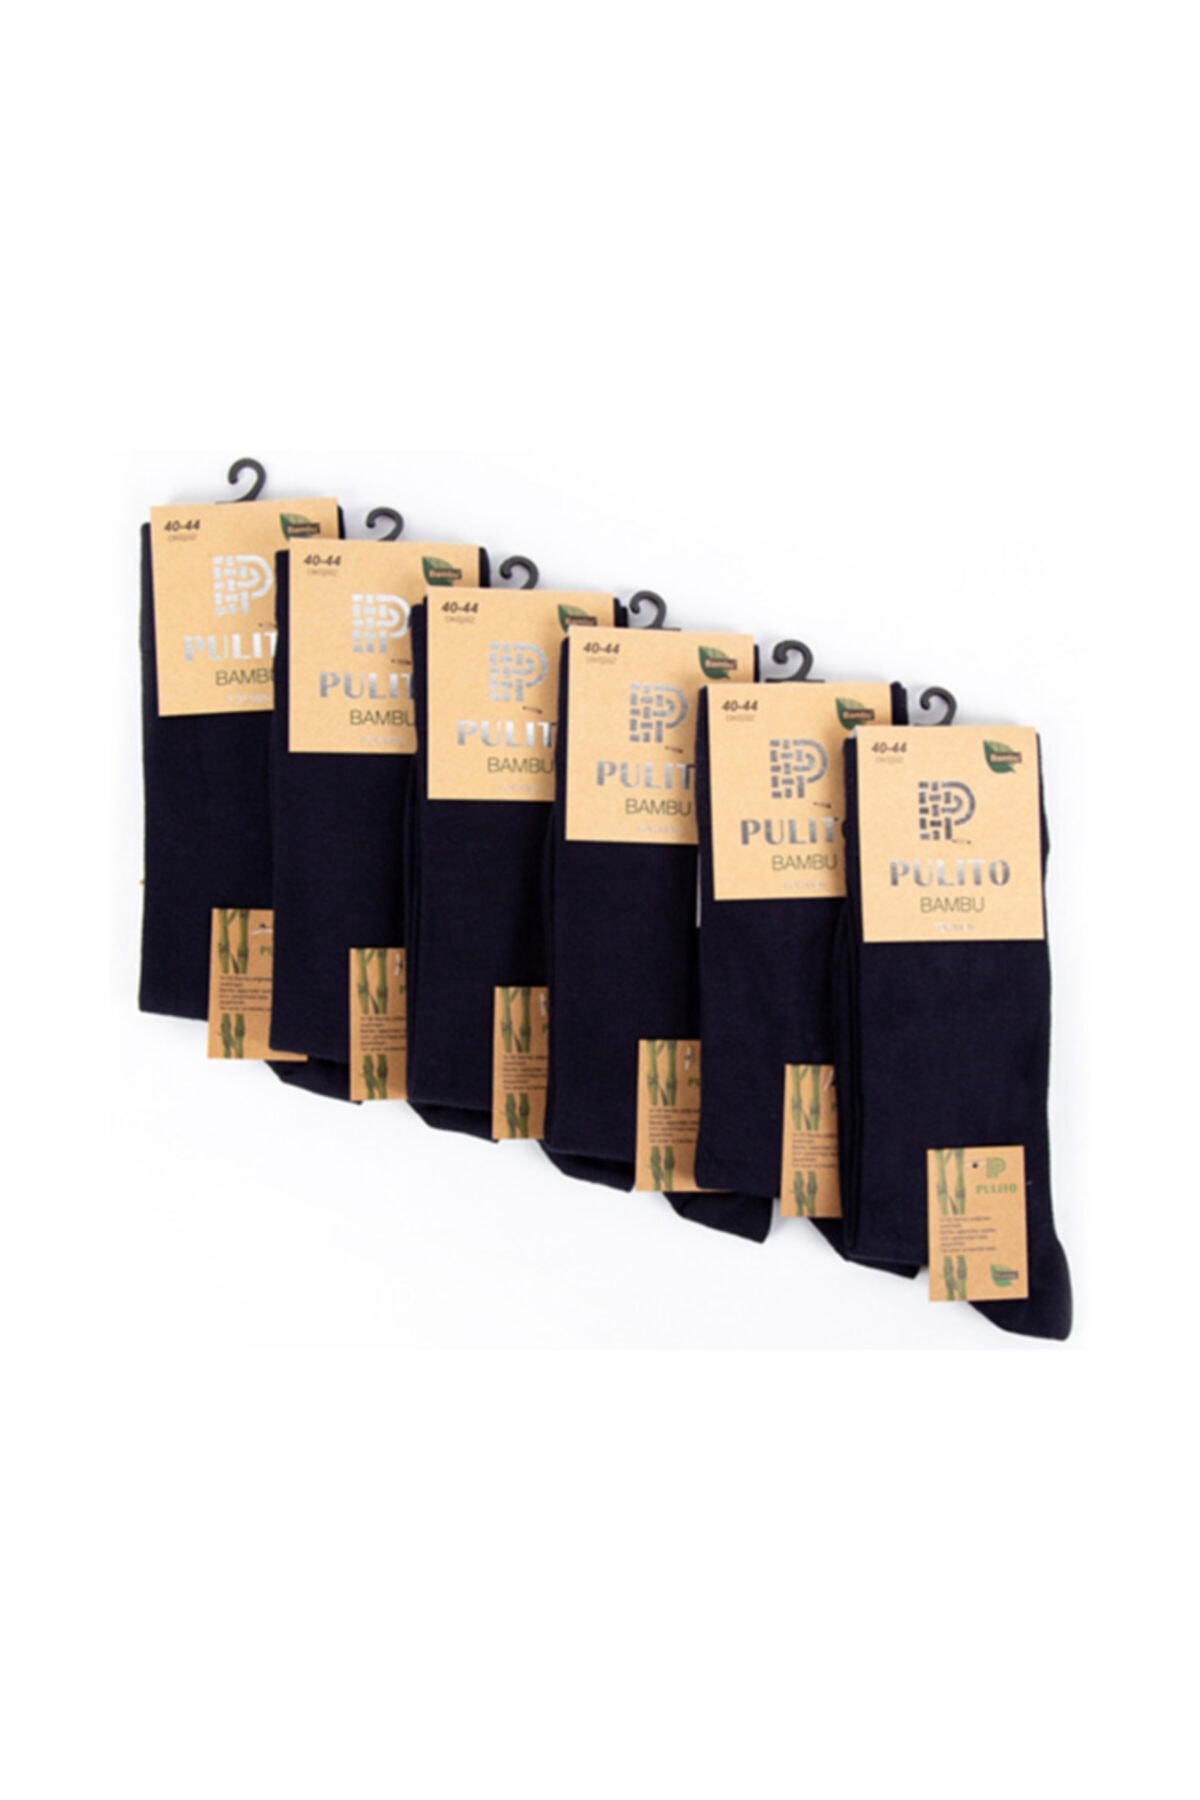 PULITO Erkek Bambu Çorap Dikişsiz 6'lı Siyah 1